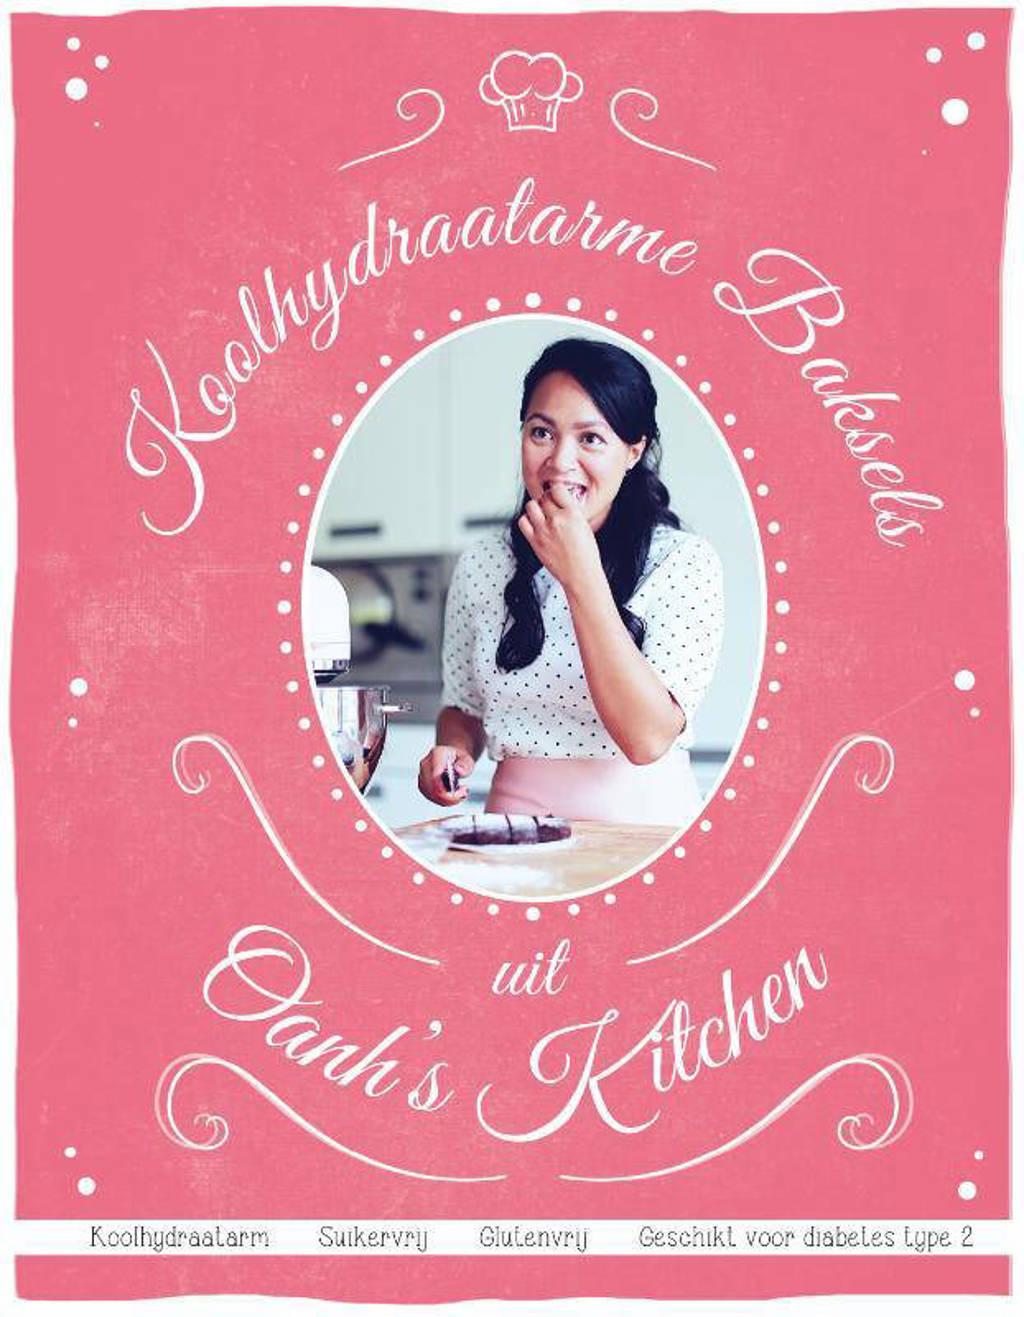 Oanh's Kitchen: Koolhydraatarme baksels uit Oanh's kitchen - Oanh Ha Thi Ngoc